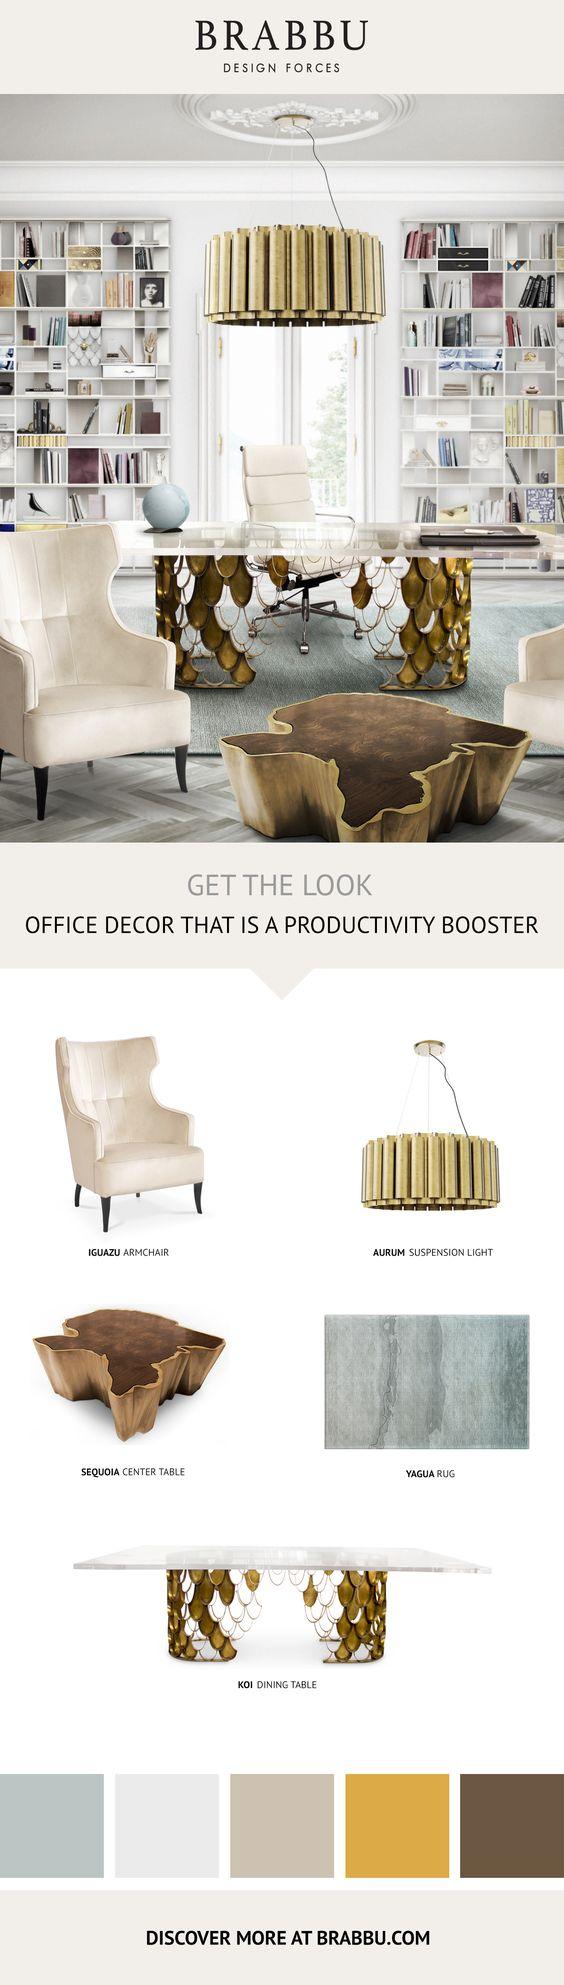 5 Outstanding Interior Design Tips To Always Have in Mind  5 Outstanding Interior Design Tips To Always Have in Mind! 5 Outstanding Interior Design Tips To Always Have in Mind! office decor